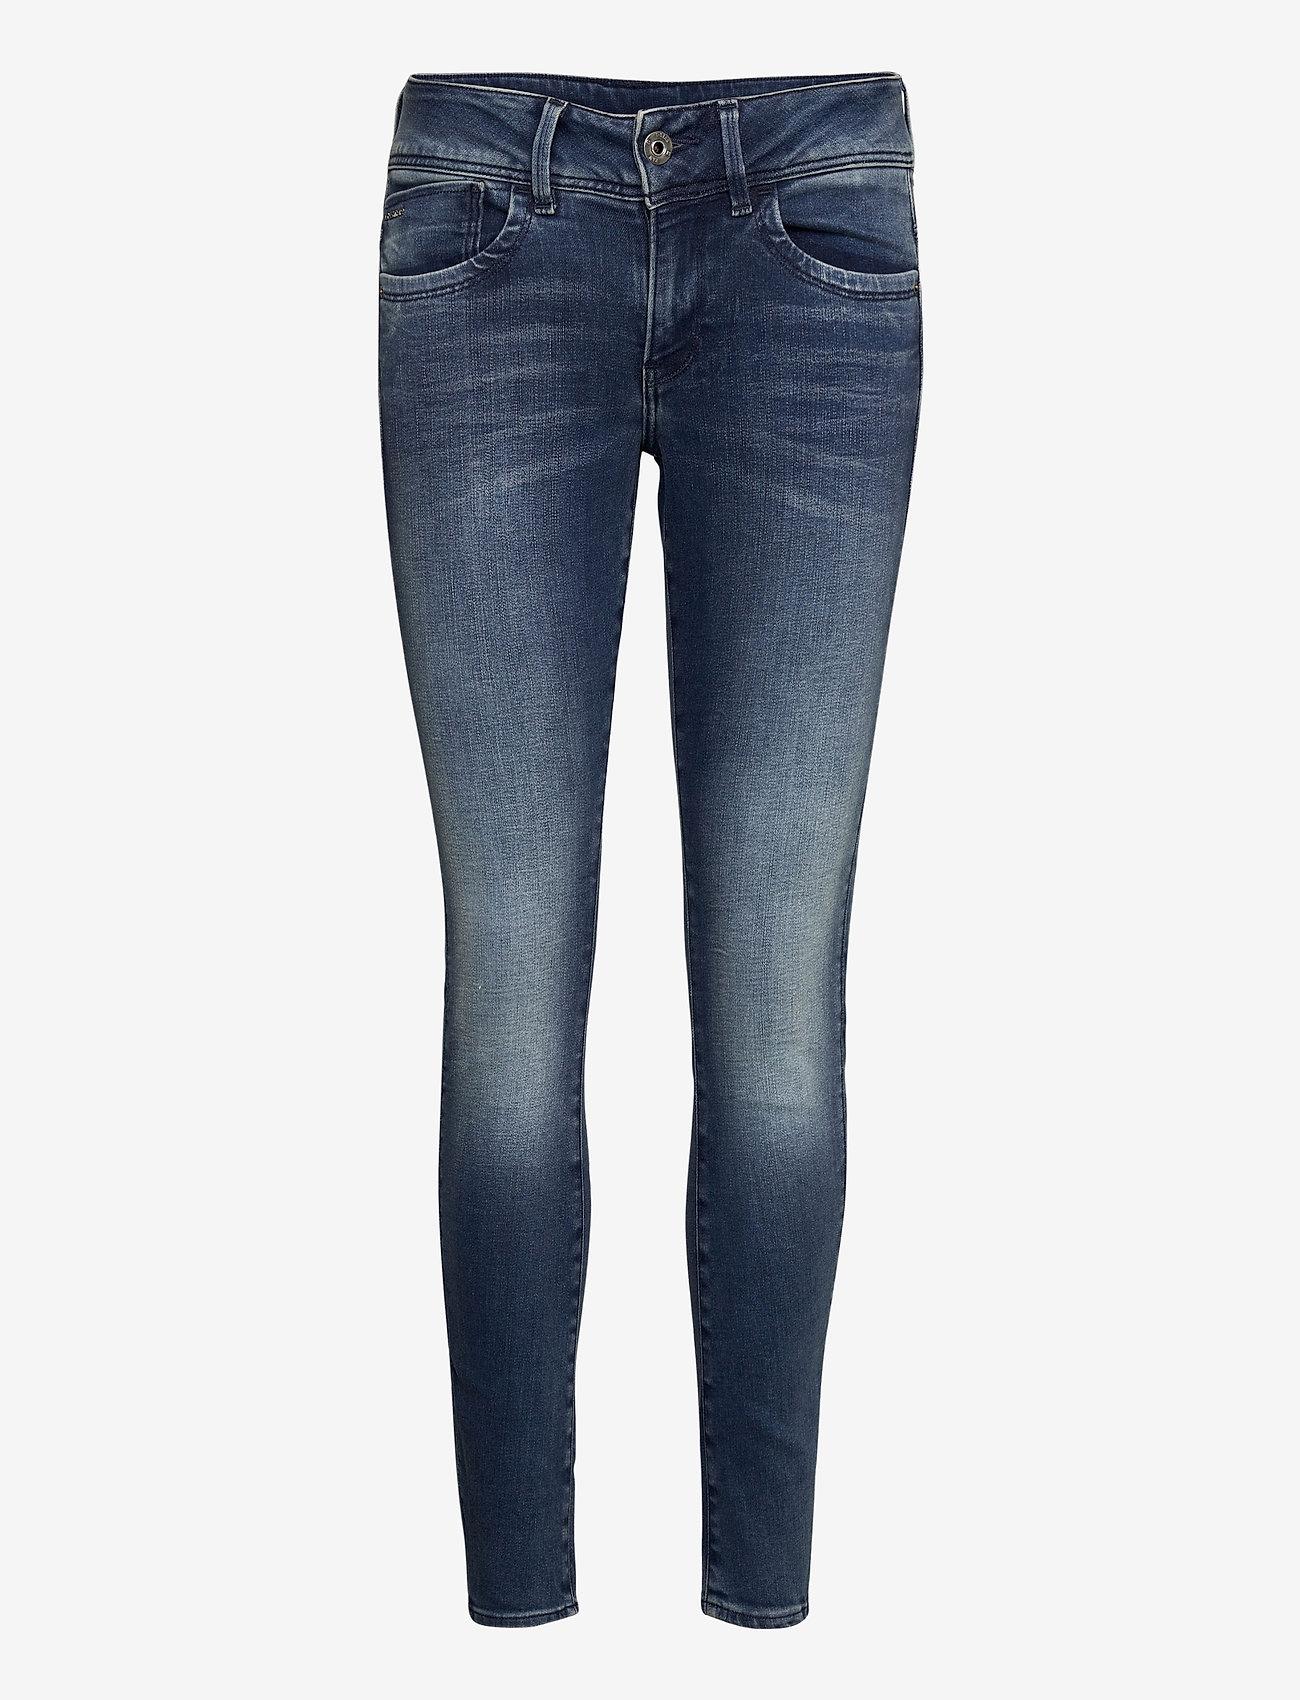 G-star RAW - Lynn Mid Skinny Wmn NEW - skinny jeans - antic blue - 0